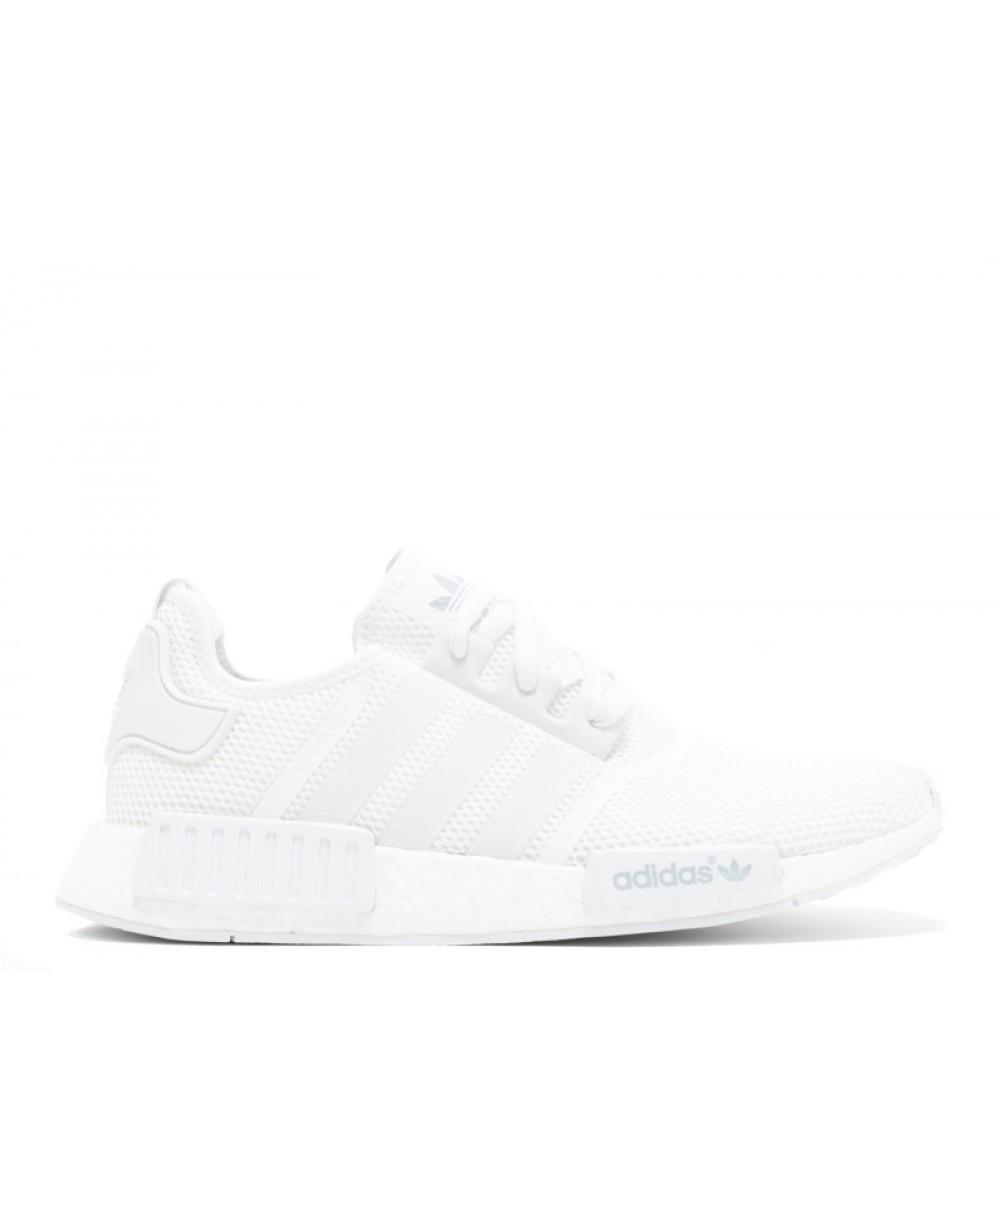 best service 0eea6 25266 1000x1231 Best Ua Adidas Nmd Cs1 Pk City Sock Sneakers For Sale